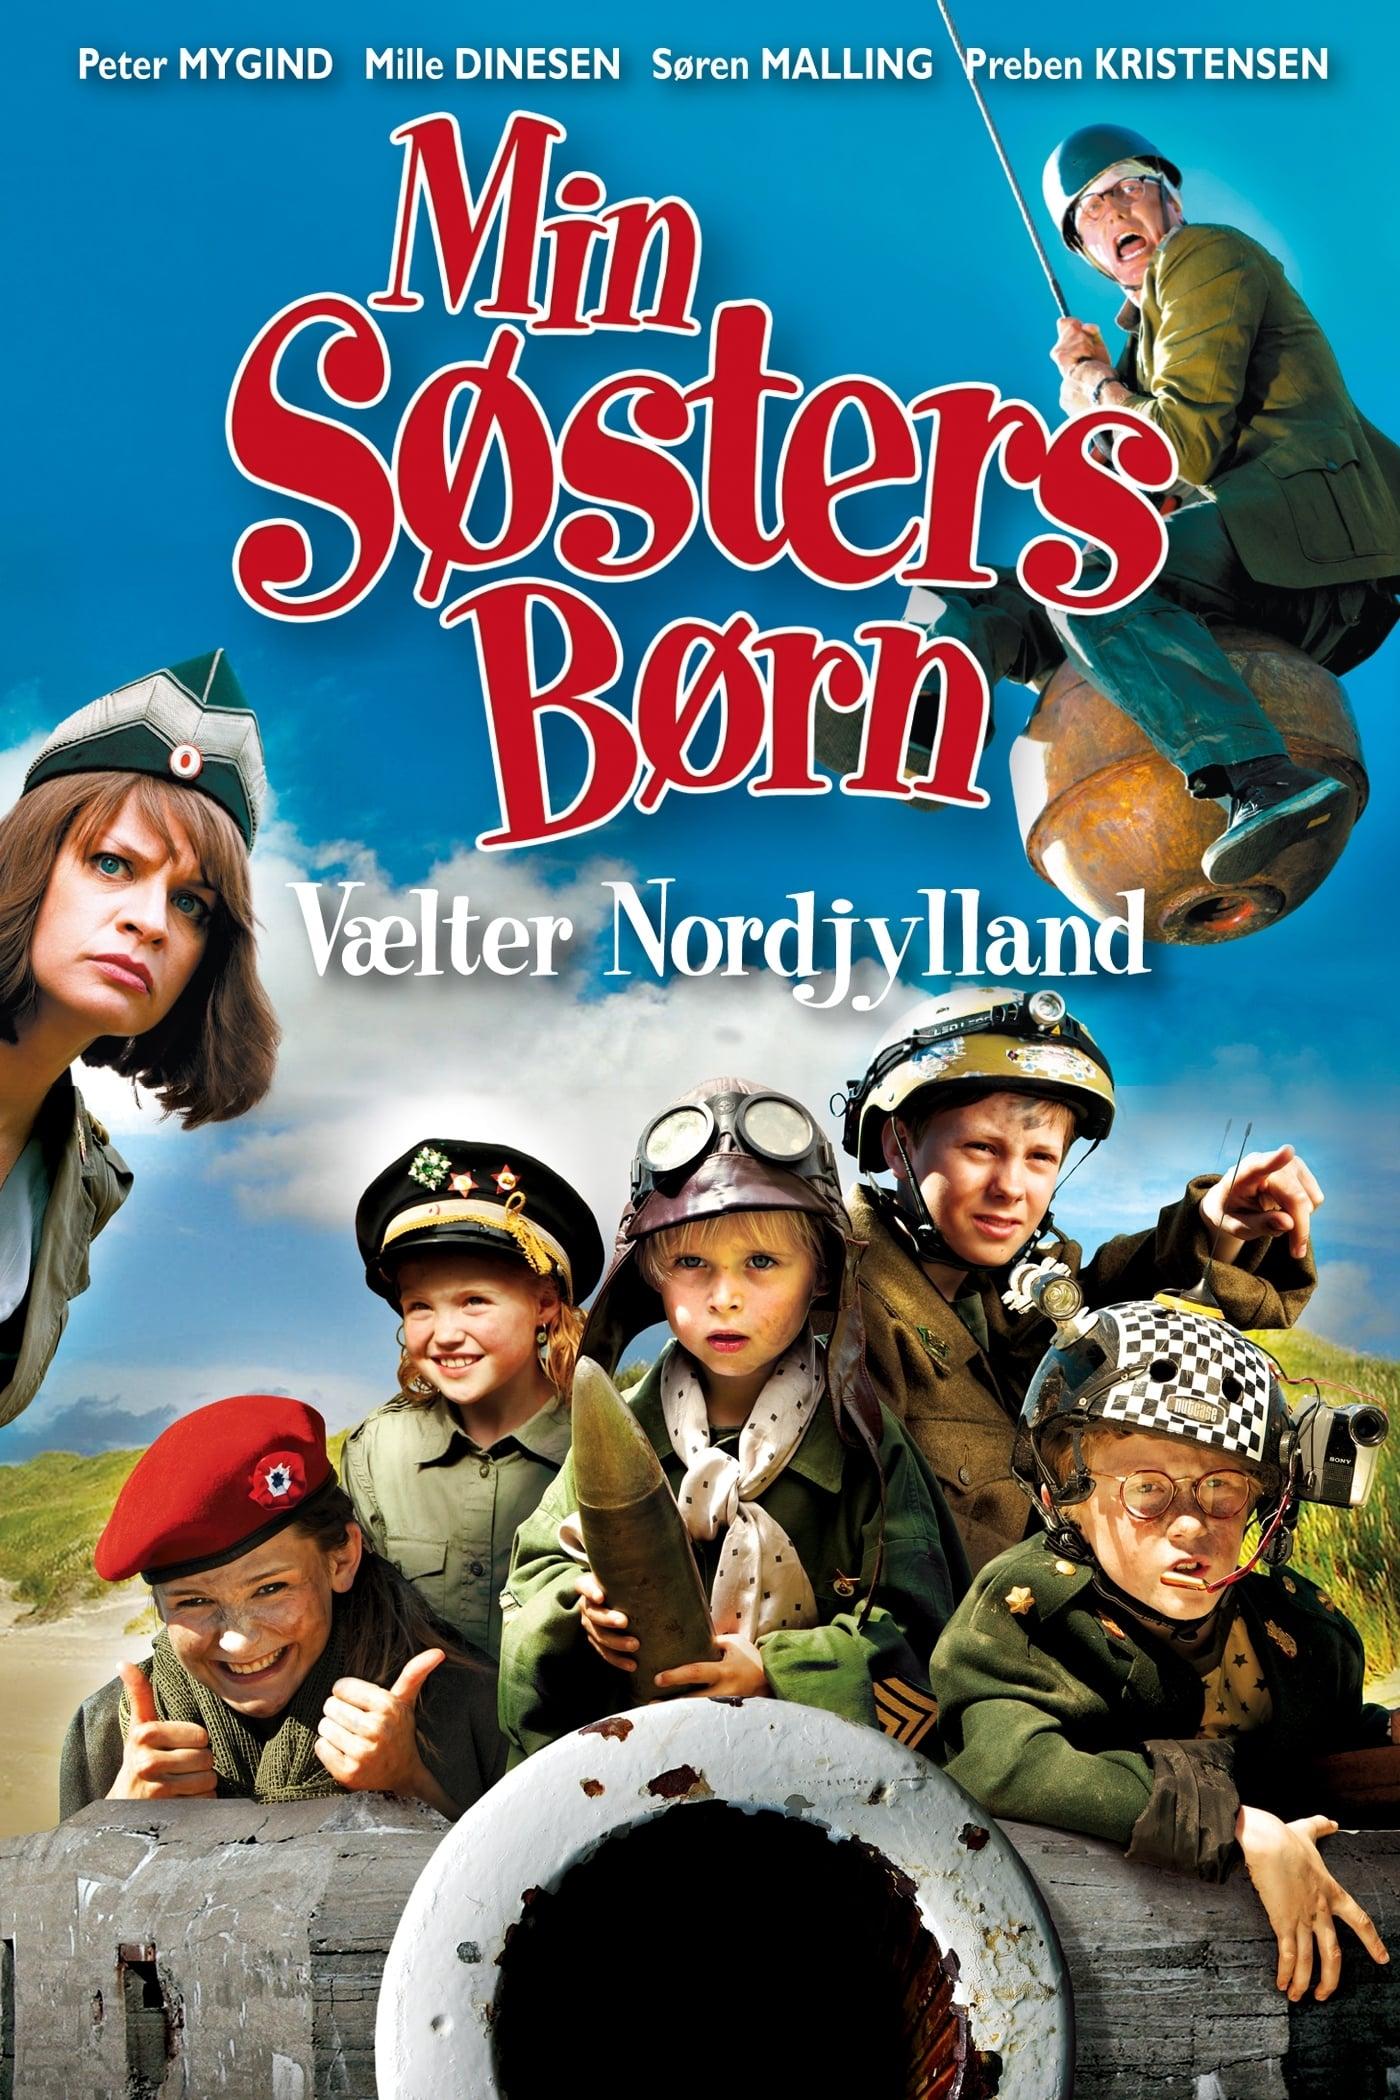 My Sister's Kids in Jutland